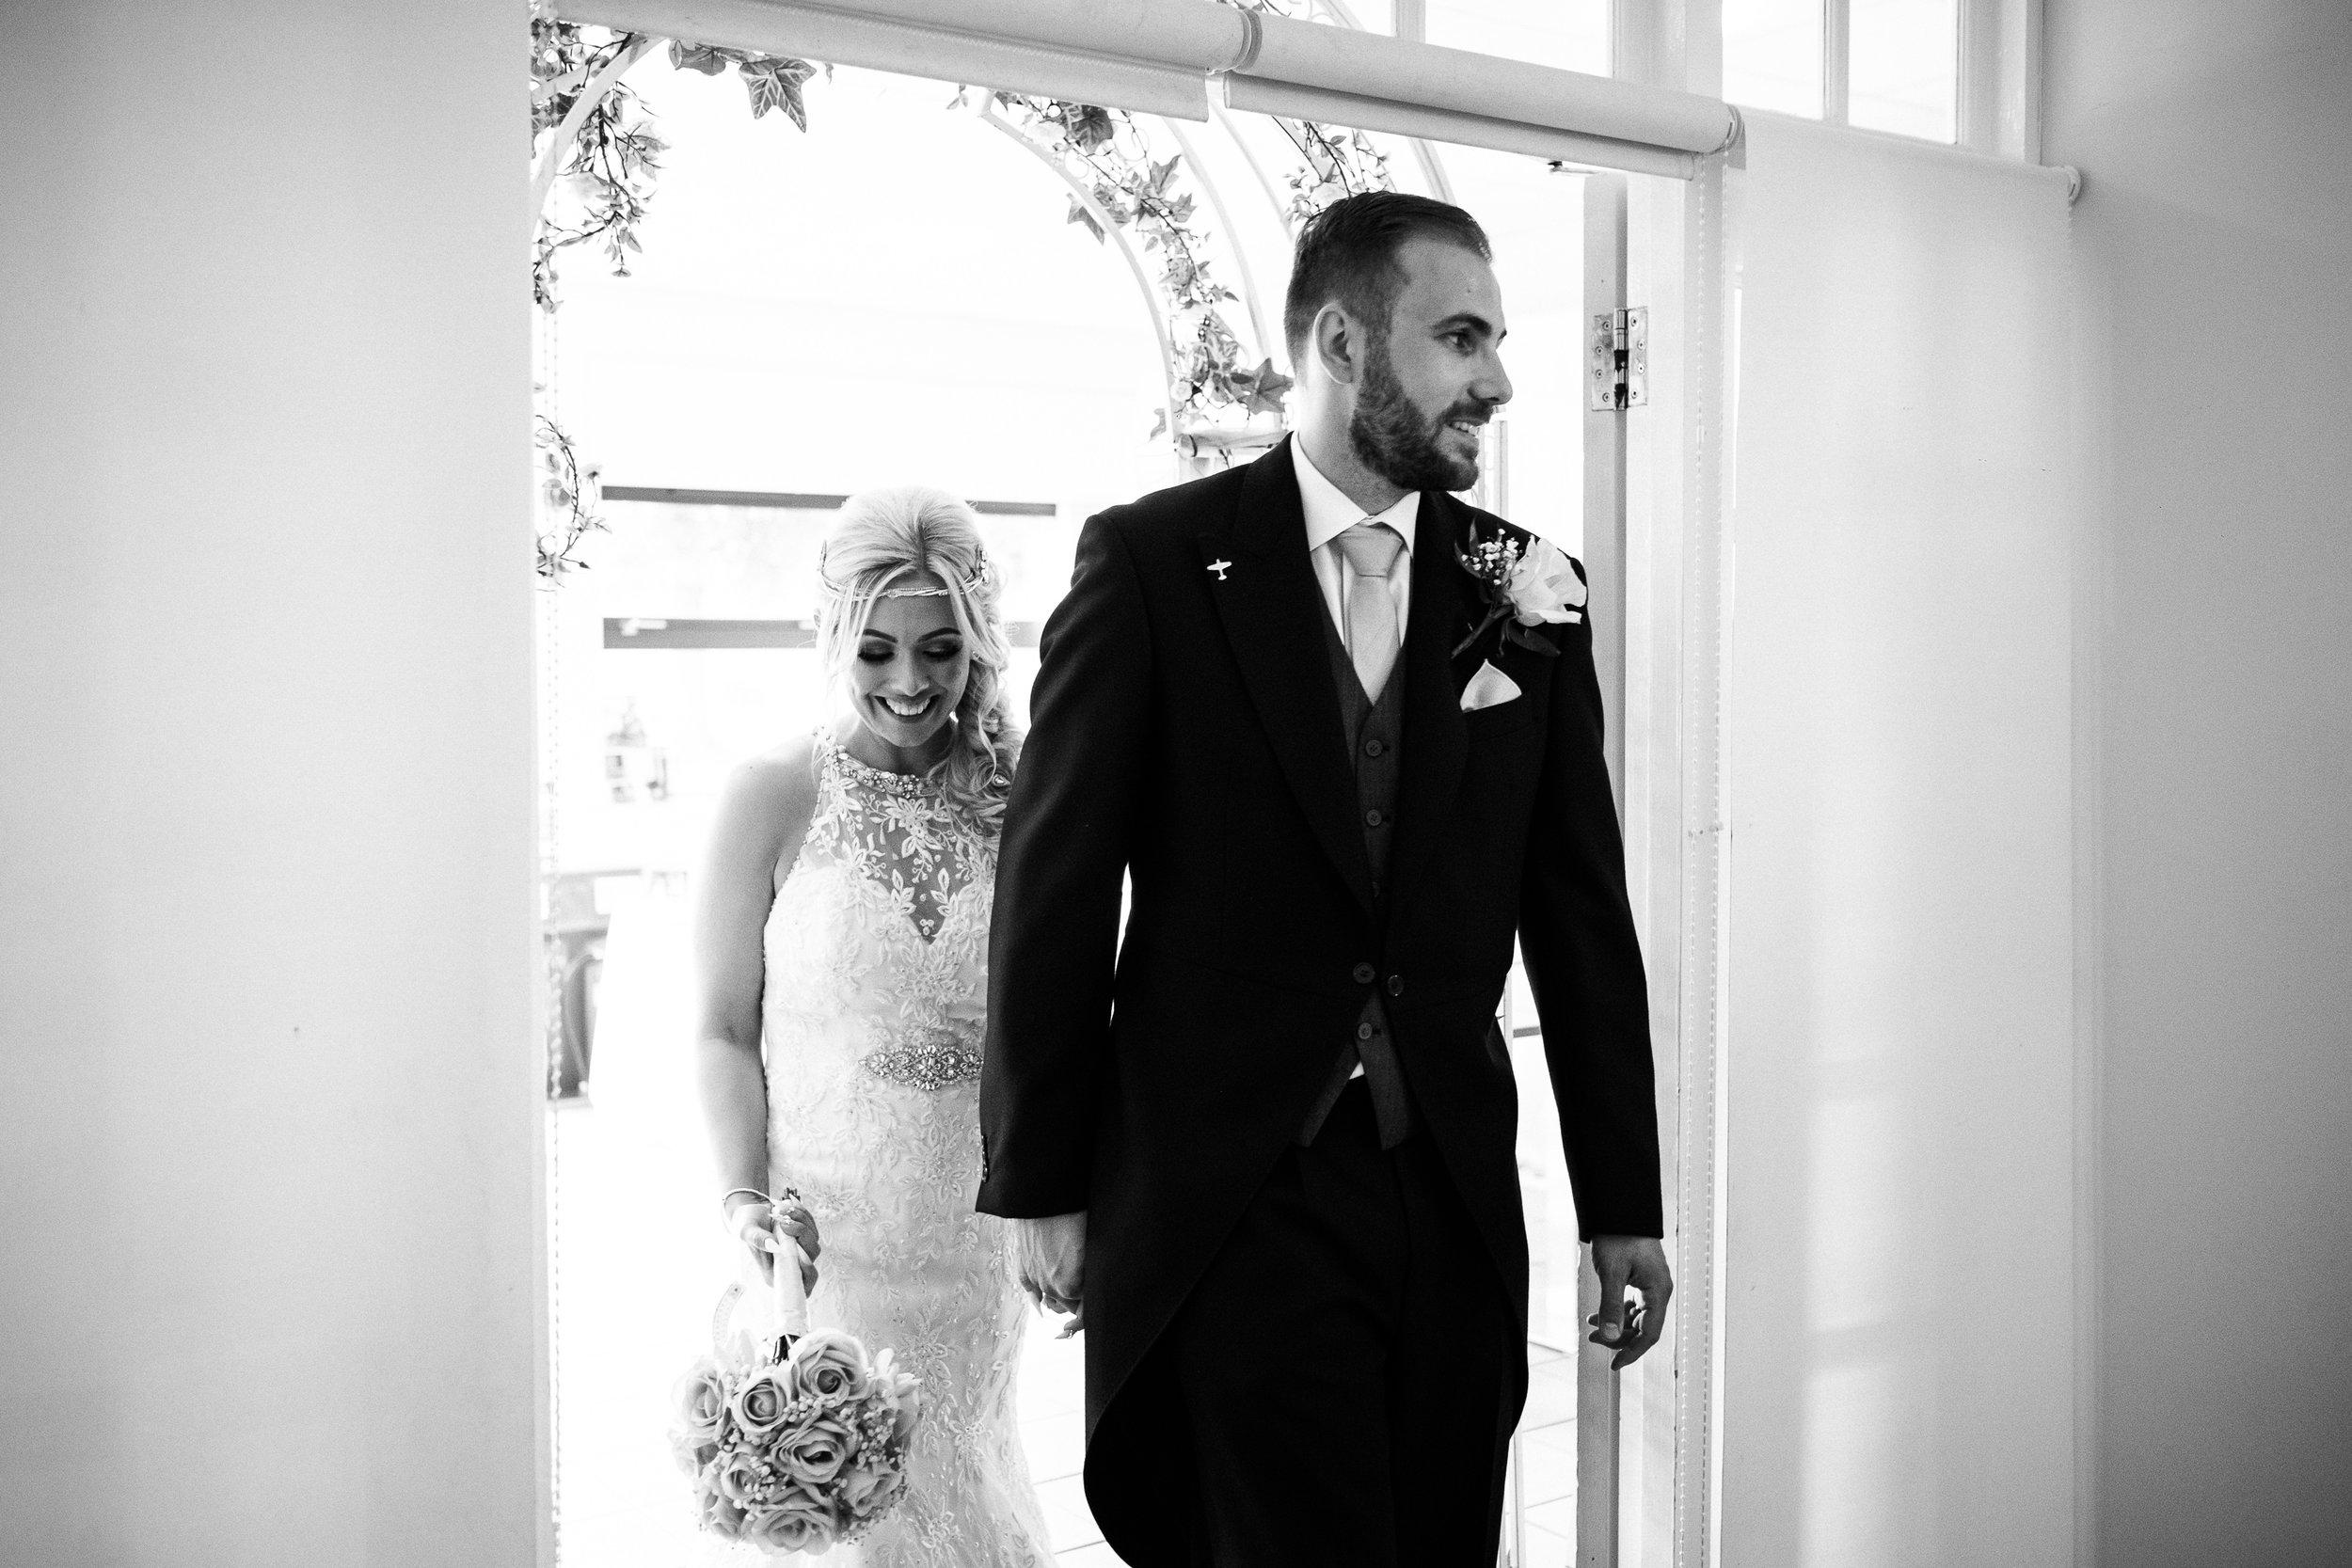 Summer Documentary Wedding Photography Floral Hall, Stoke-on-Trent, Staffordshire - Jenny Harper-38.jpg